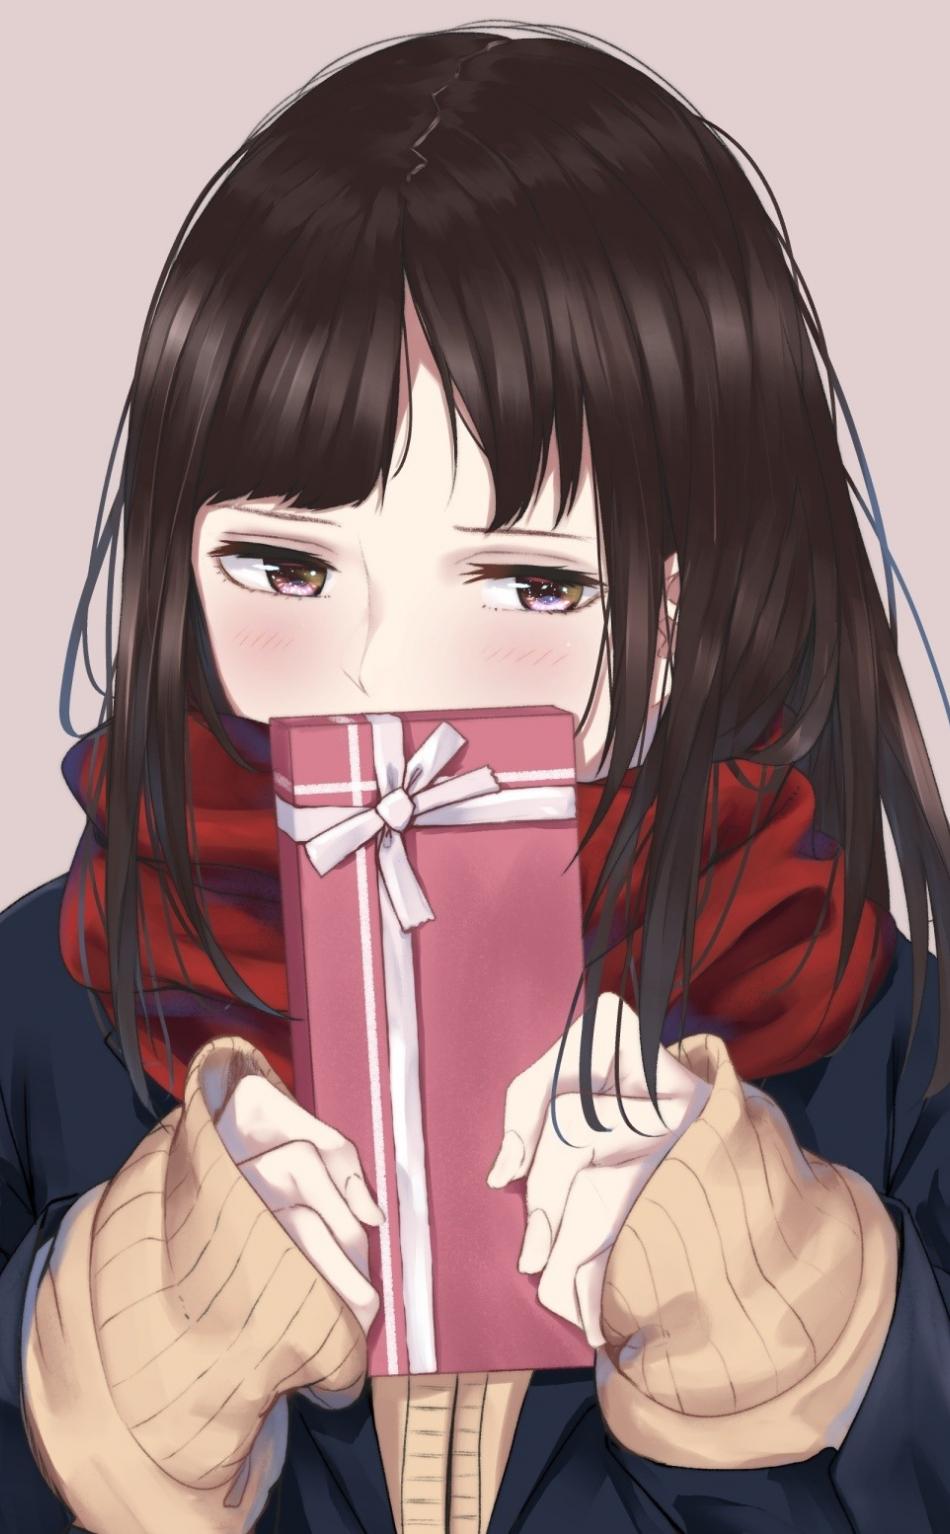 Cute Anime Girl Shy Gift Box 950x1534 Wallpaper